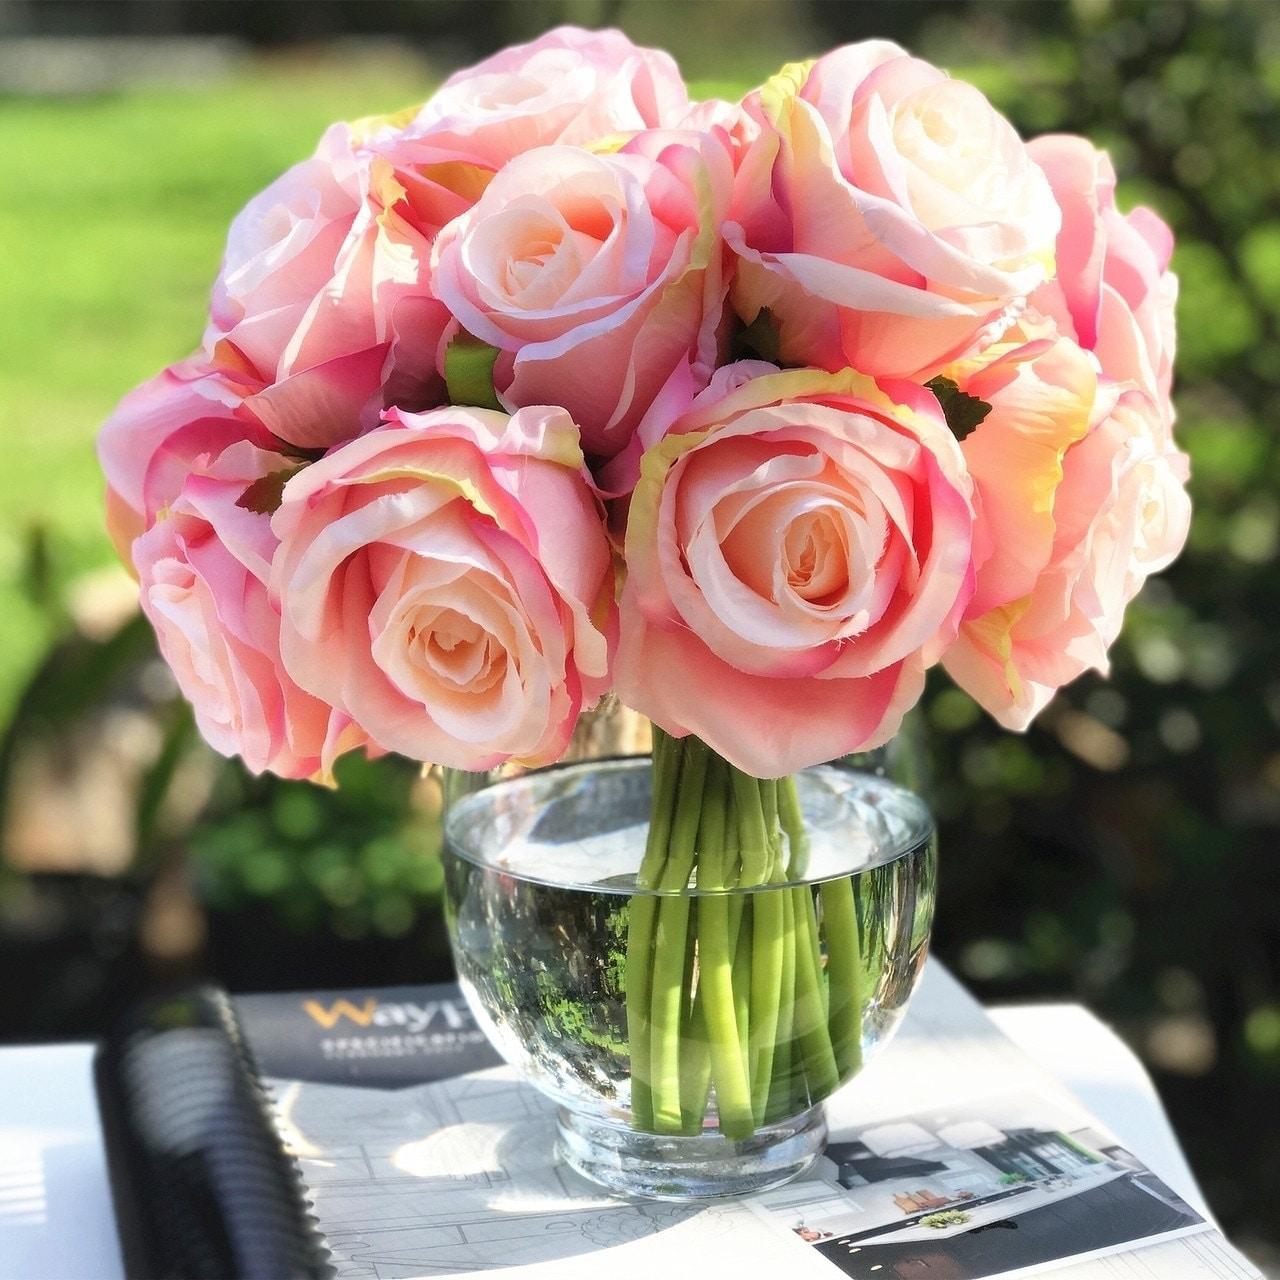 Enova Home Pink Artificial Silk Open Rose Flower Arrangements With Glass Vase Overstock 27552478